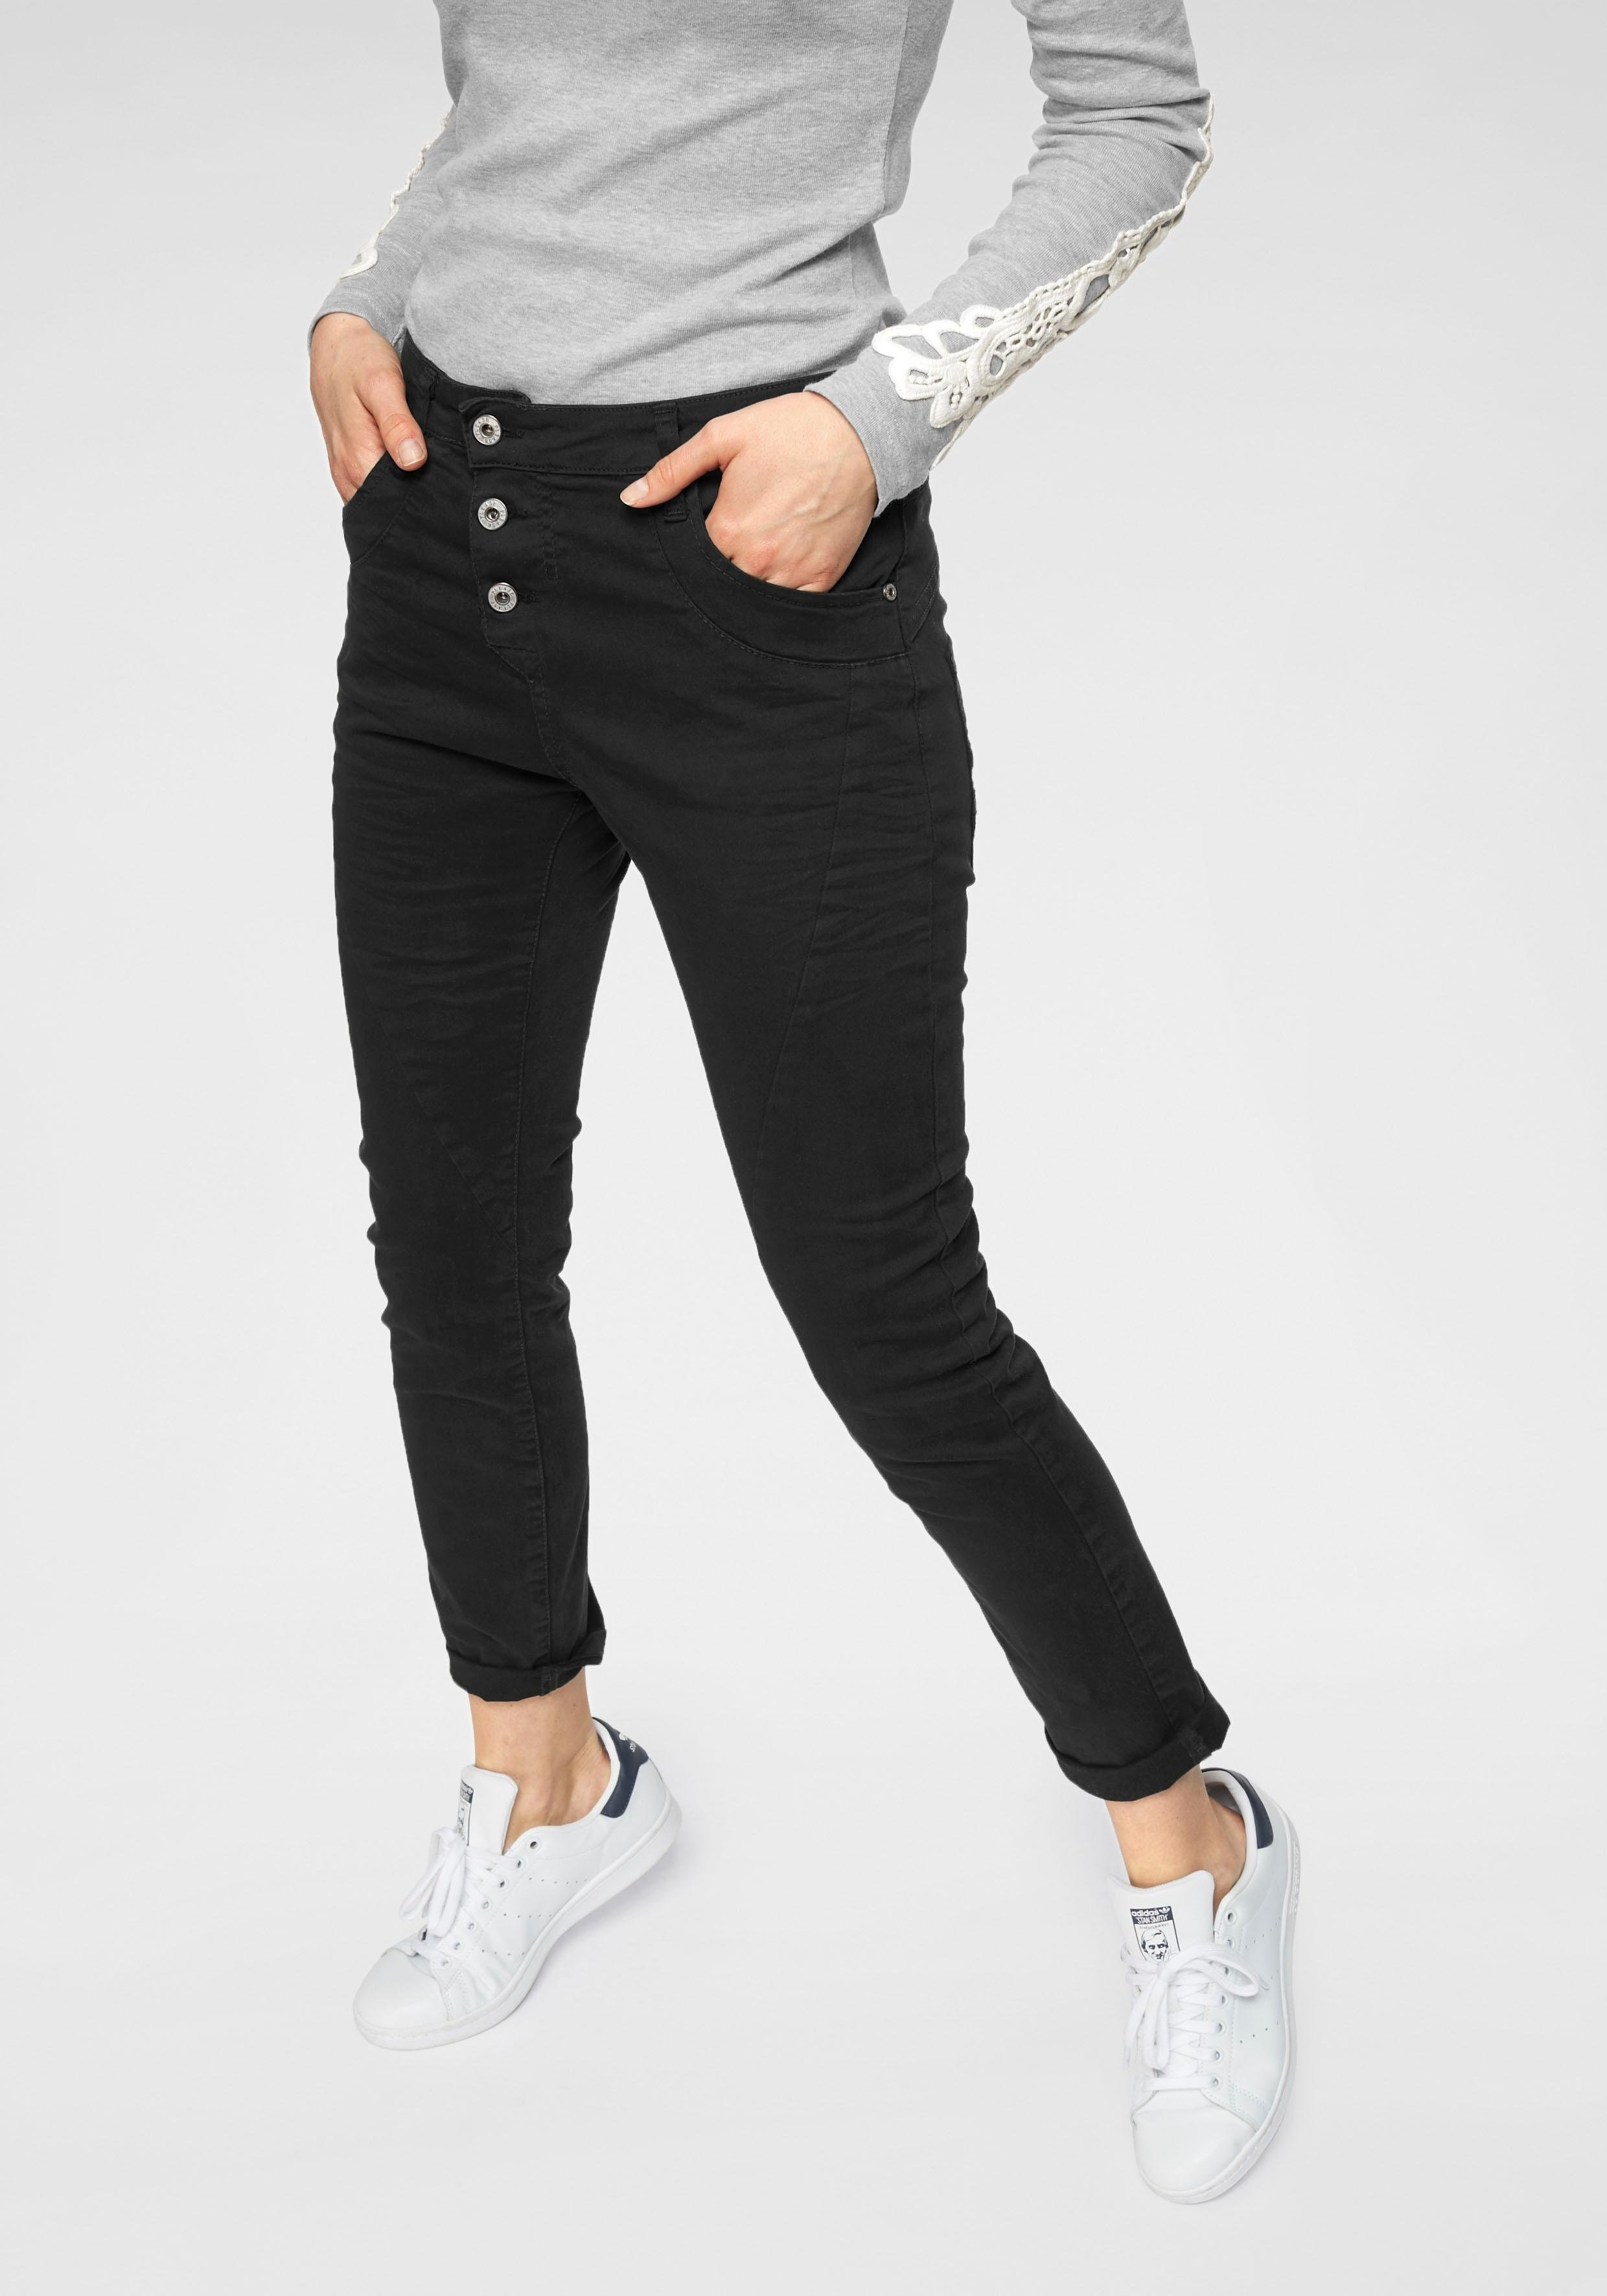 Please Jeans 5-pocketsjeans P78A casual boyfriend jeans in lichte krinkel-look, met omslag aan de pijpen bestellen: 30 dagen bedenktijd